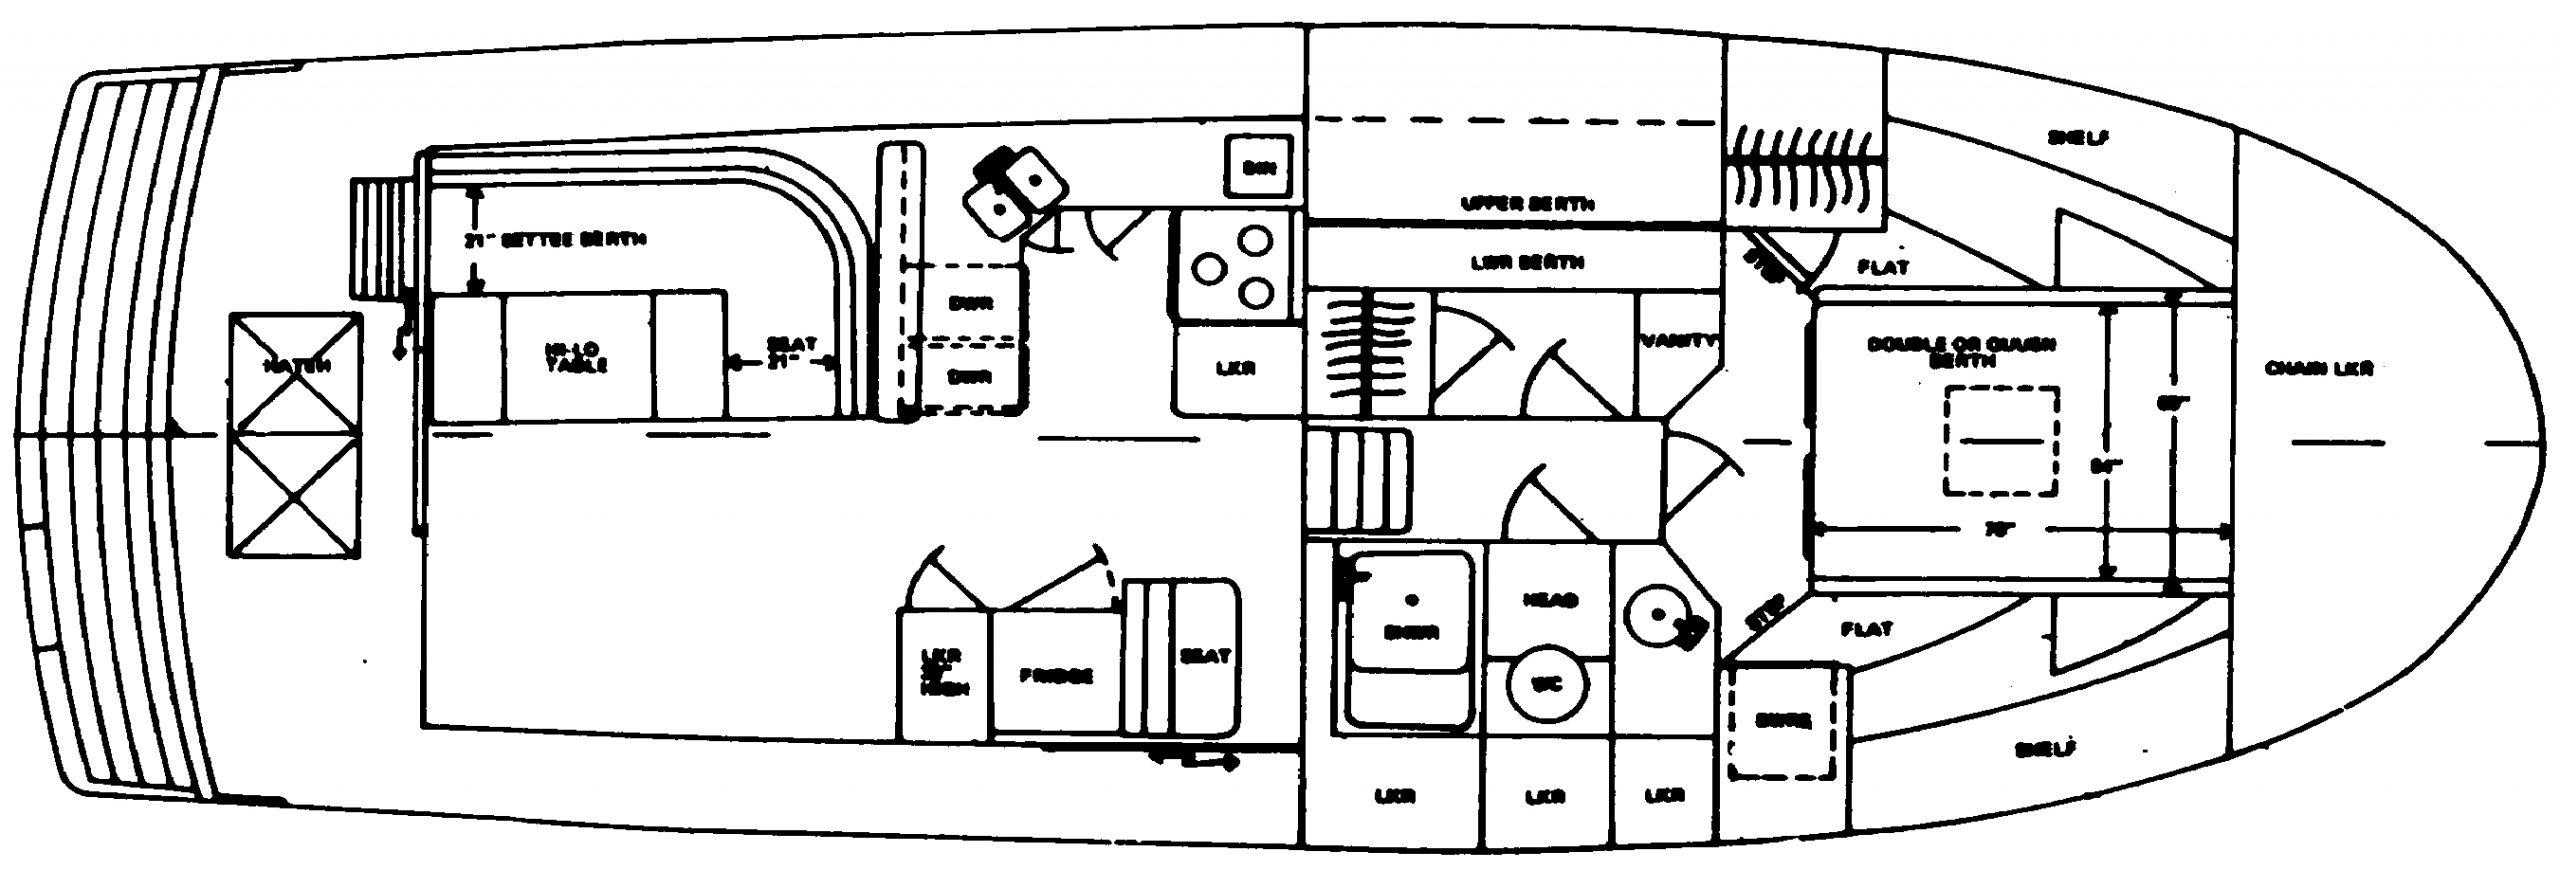 38 Sedan Trawler Floor Plan 1